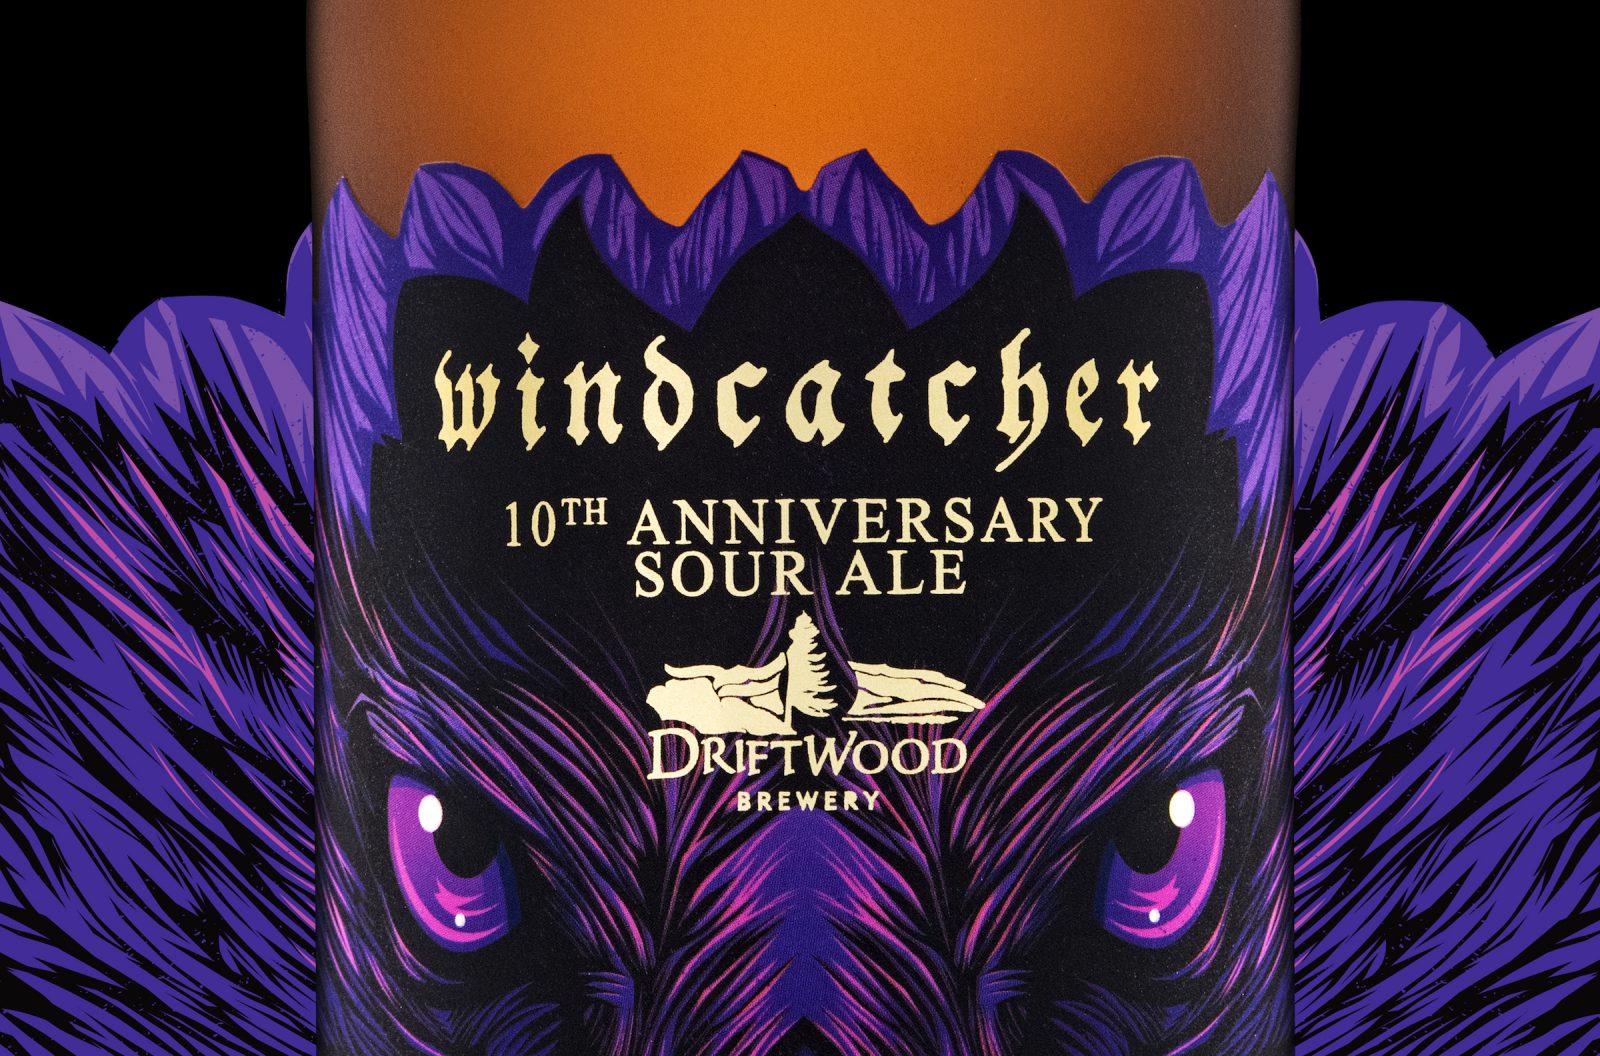 Windcatcher Anniversary Ale, Bird of Prey Sour Series